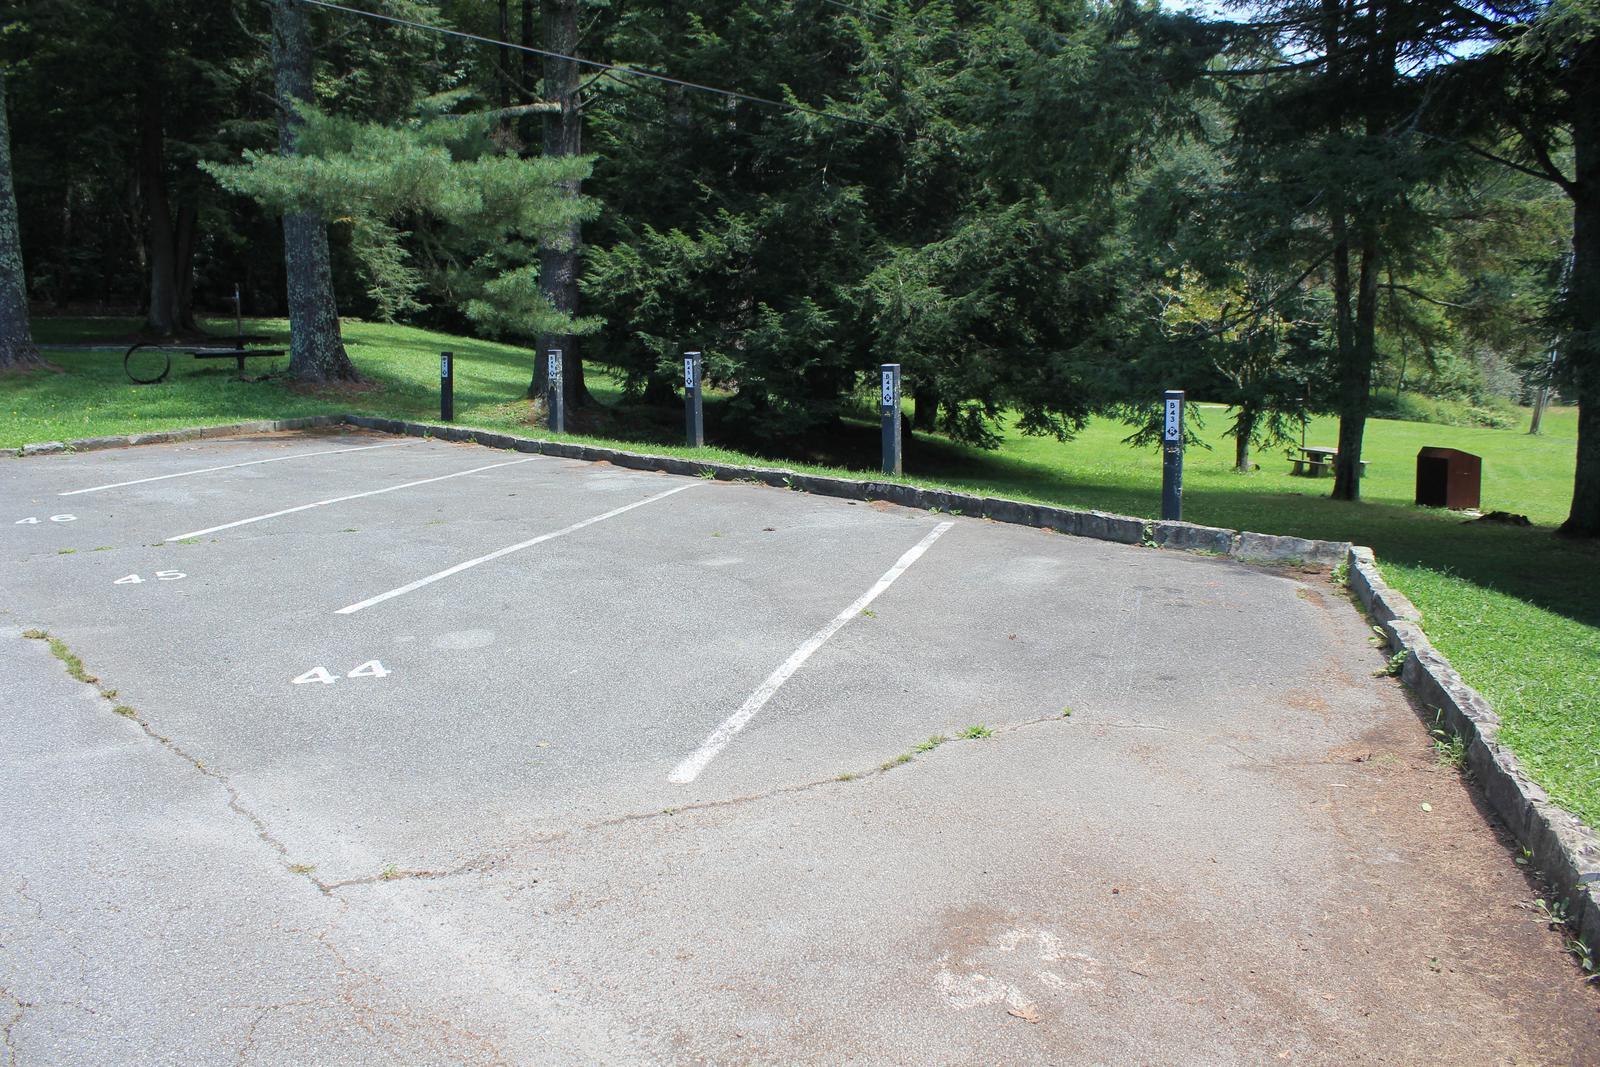 Group Site 1 Parking (B43, B44, & B45)